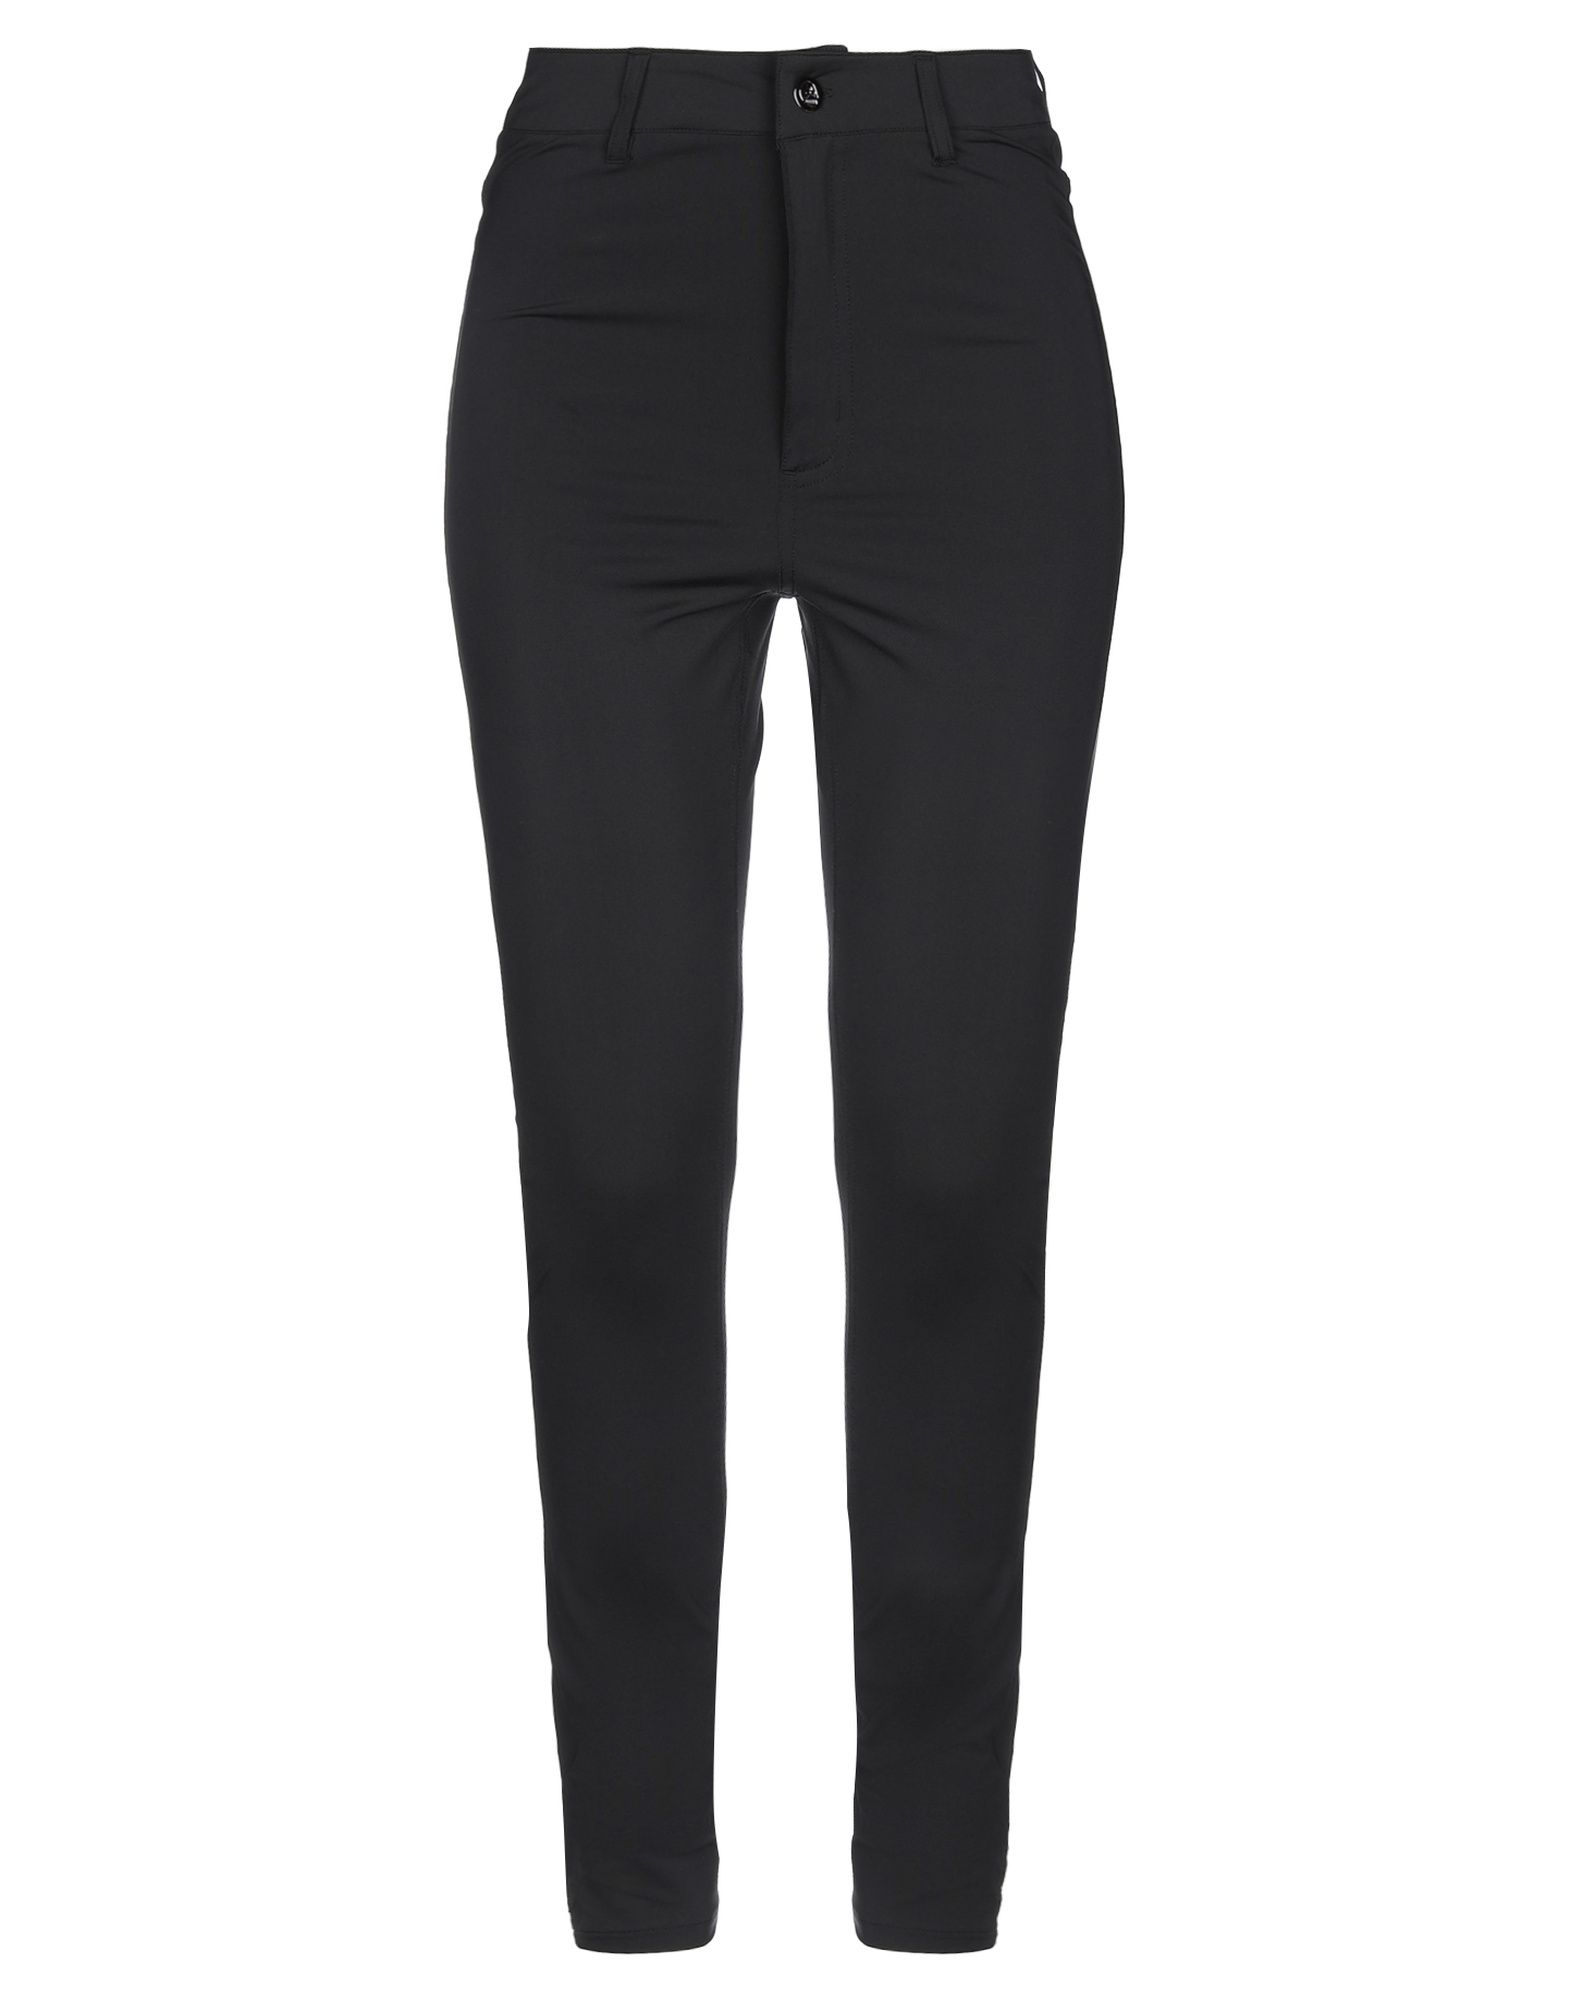 Pantalone Cheap Monday donna donna donna - 13342787BJ 7d1